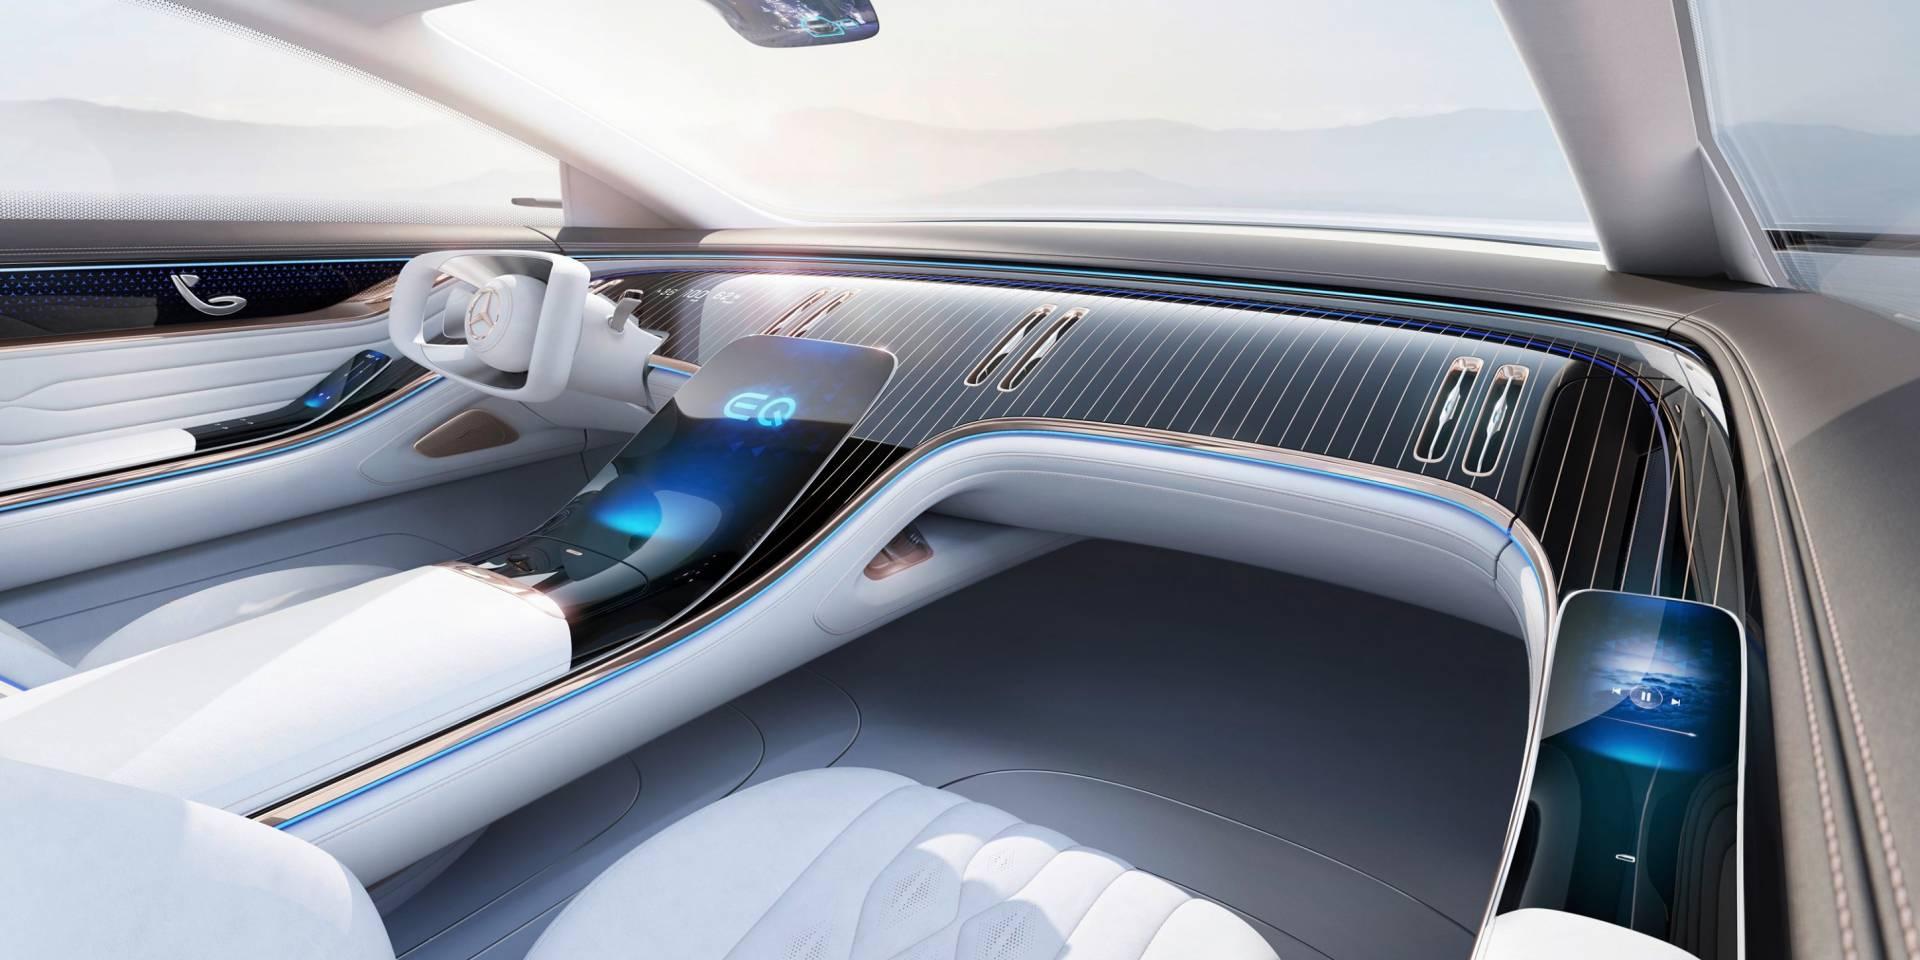 mercedes-benz-eq-concept-interior-teased-2.jpg